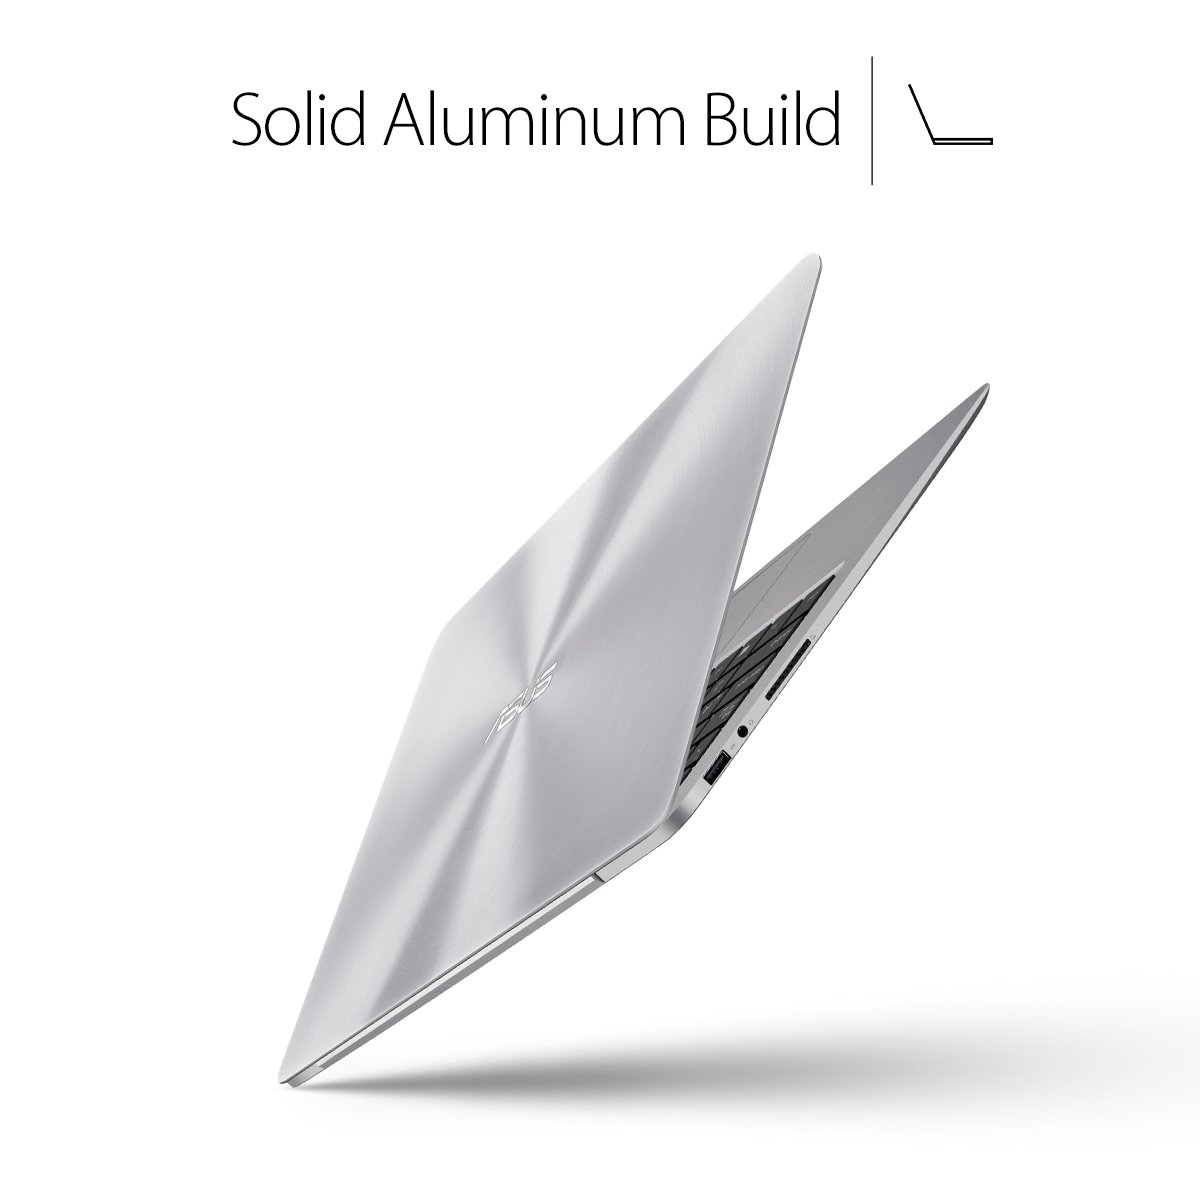 ASUS ZenBook UX330UA-AH54 13.3-inch LCD Ultra-Slim Laptop (Core i5 Processor, 8GB DDR3, 256GB SSD, Windows 10) w/ Harman Kardon Audio, Backlit keyboard, Fingerprint Reader by Asus (Image #3)